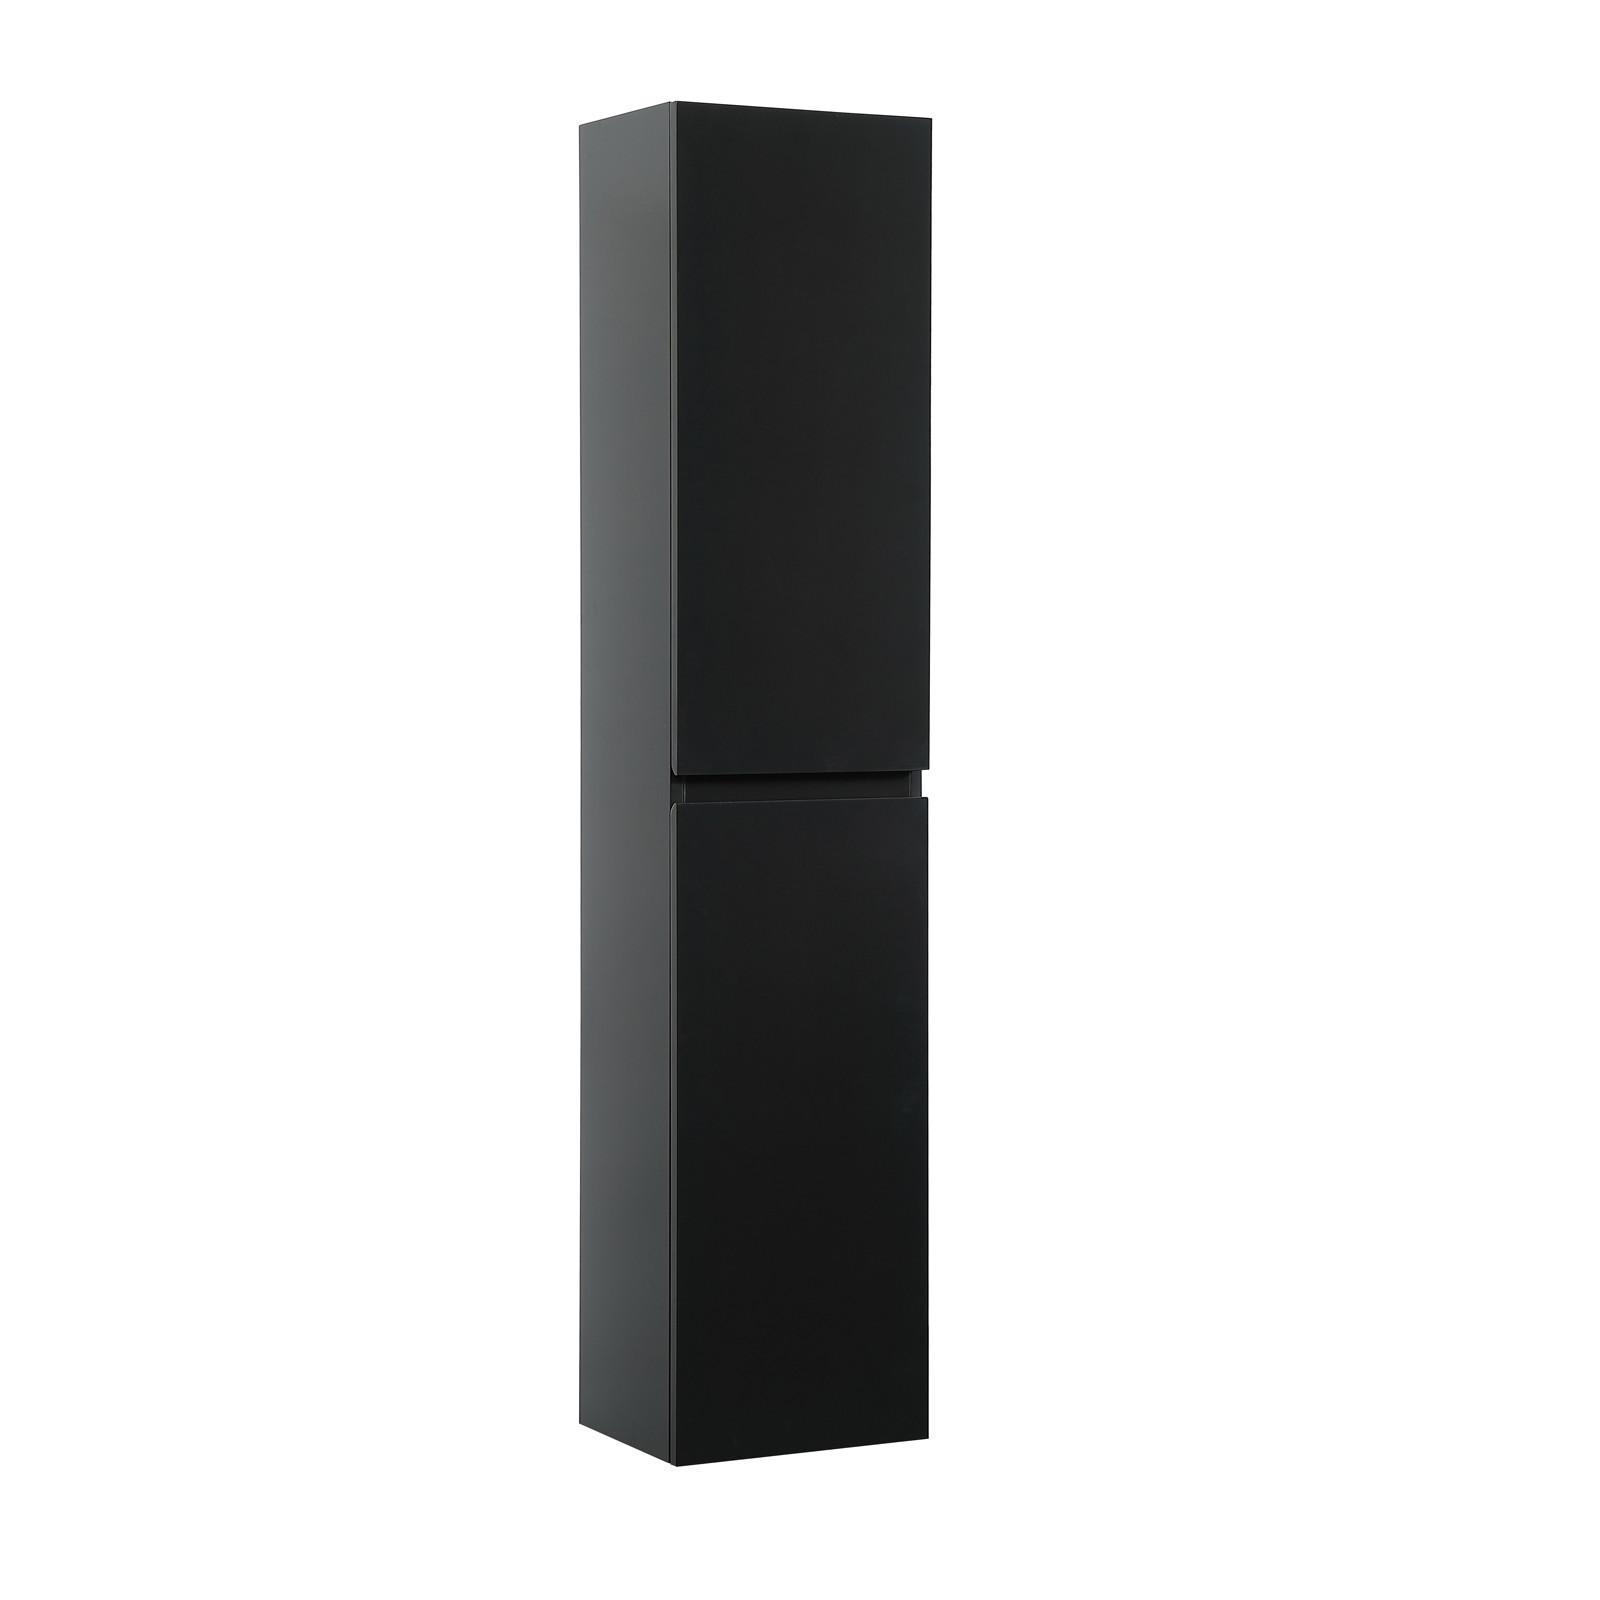 Meuble Salle de Bain 60 cm + Colonne Noir Carbone + Miroir SORRENTO